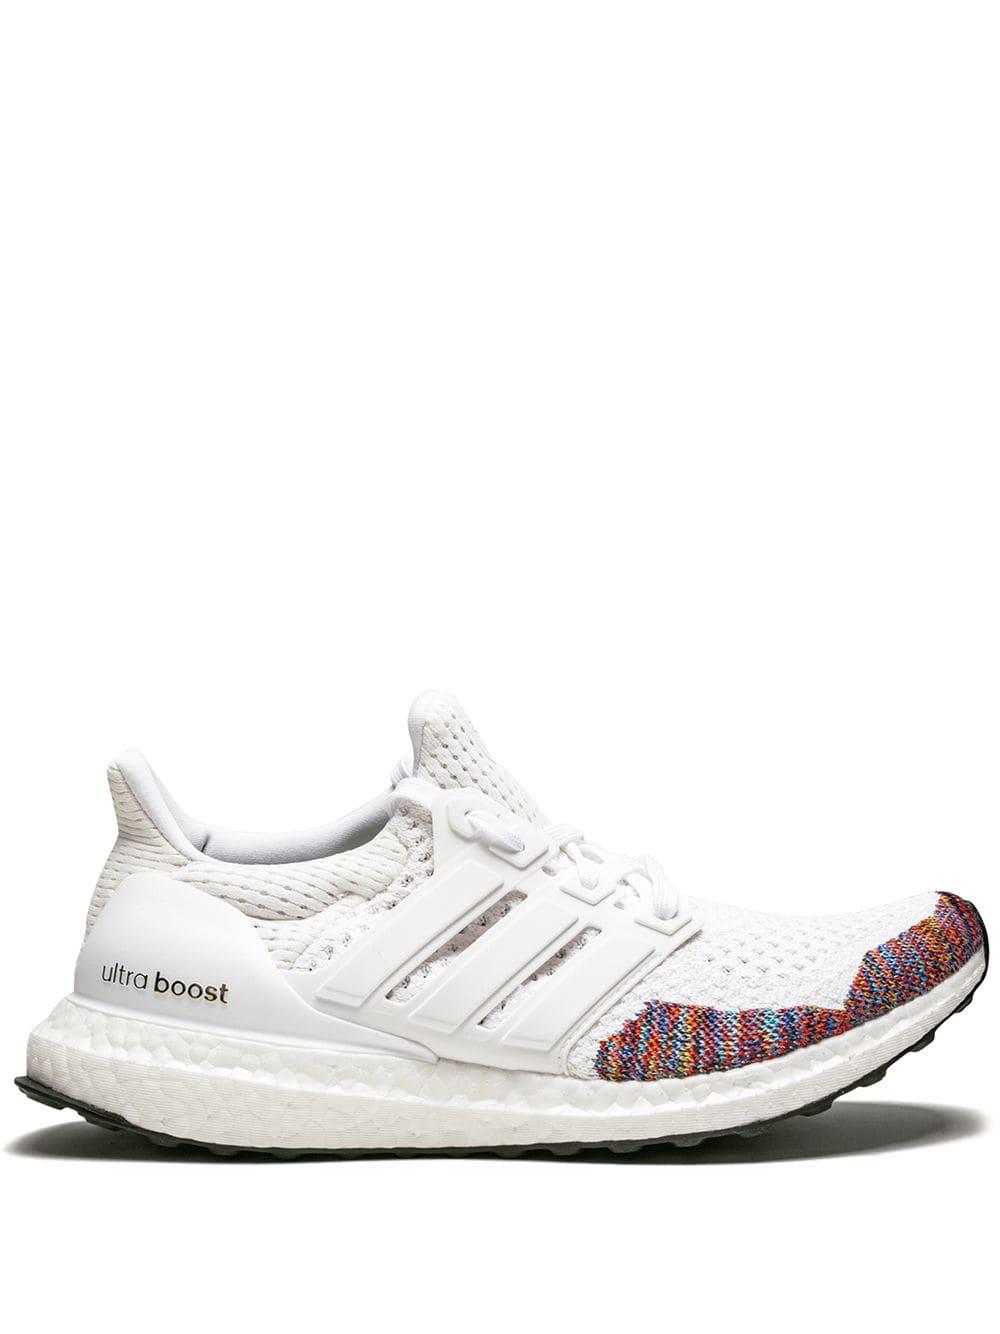 d4289f725a2 Adidas Originals Adidas Ultraboost Ltd Trainers - White